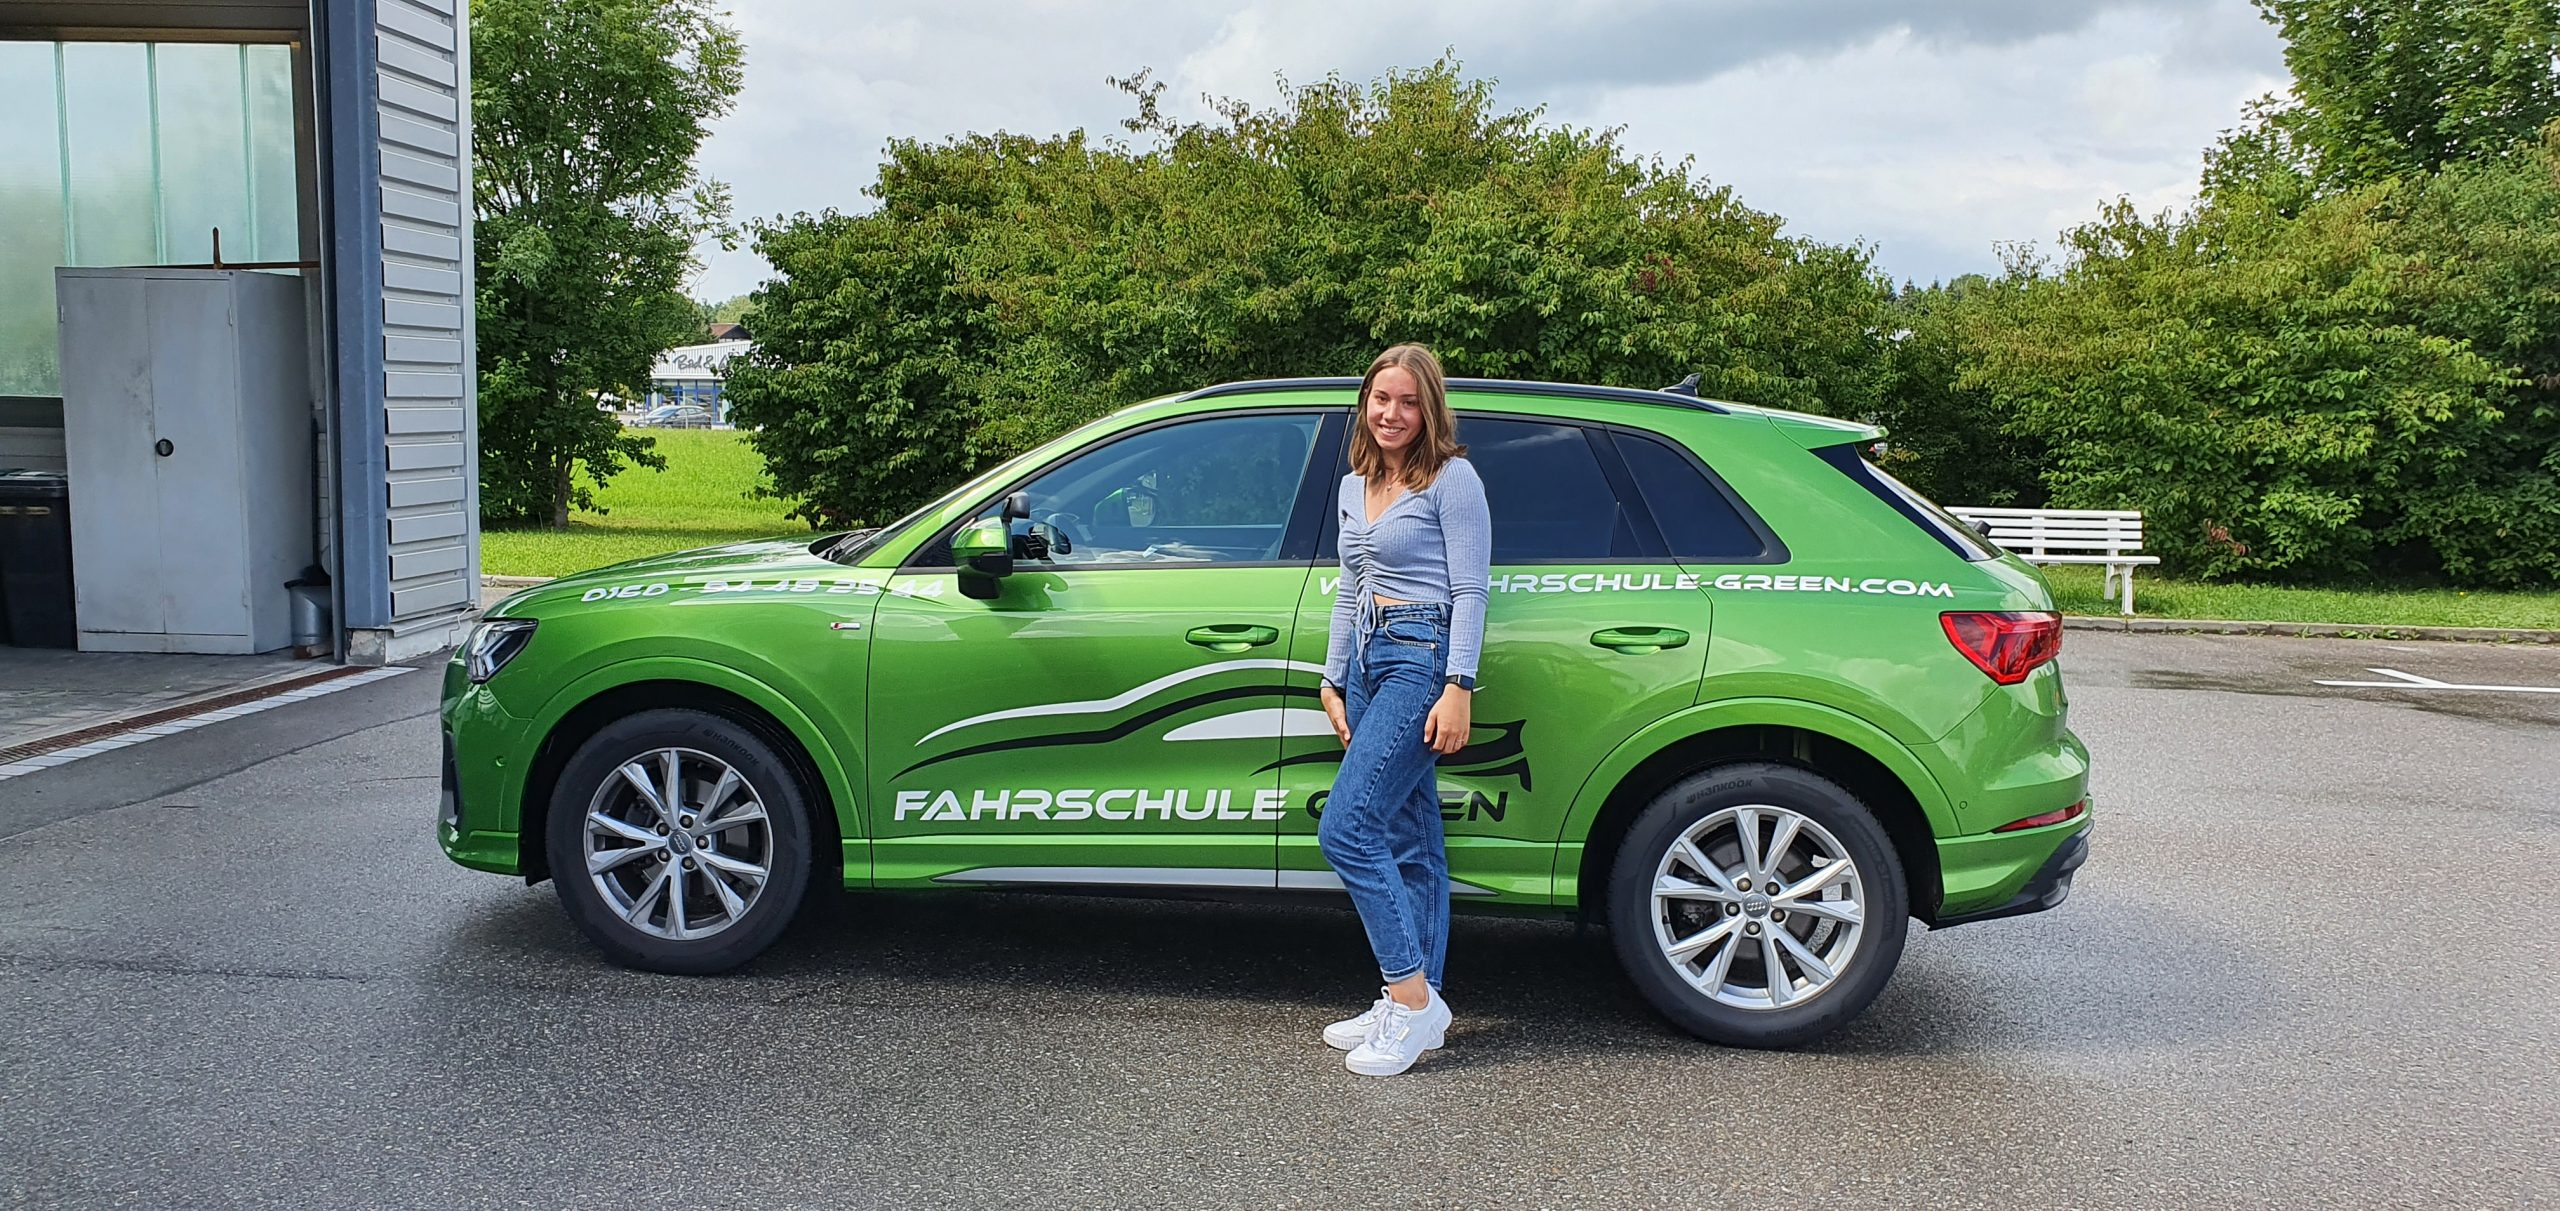 rebekka-elisabeth-stahl-pruefungen-2021-fahrschule-green-kaufbeuren-neugablonz